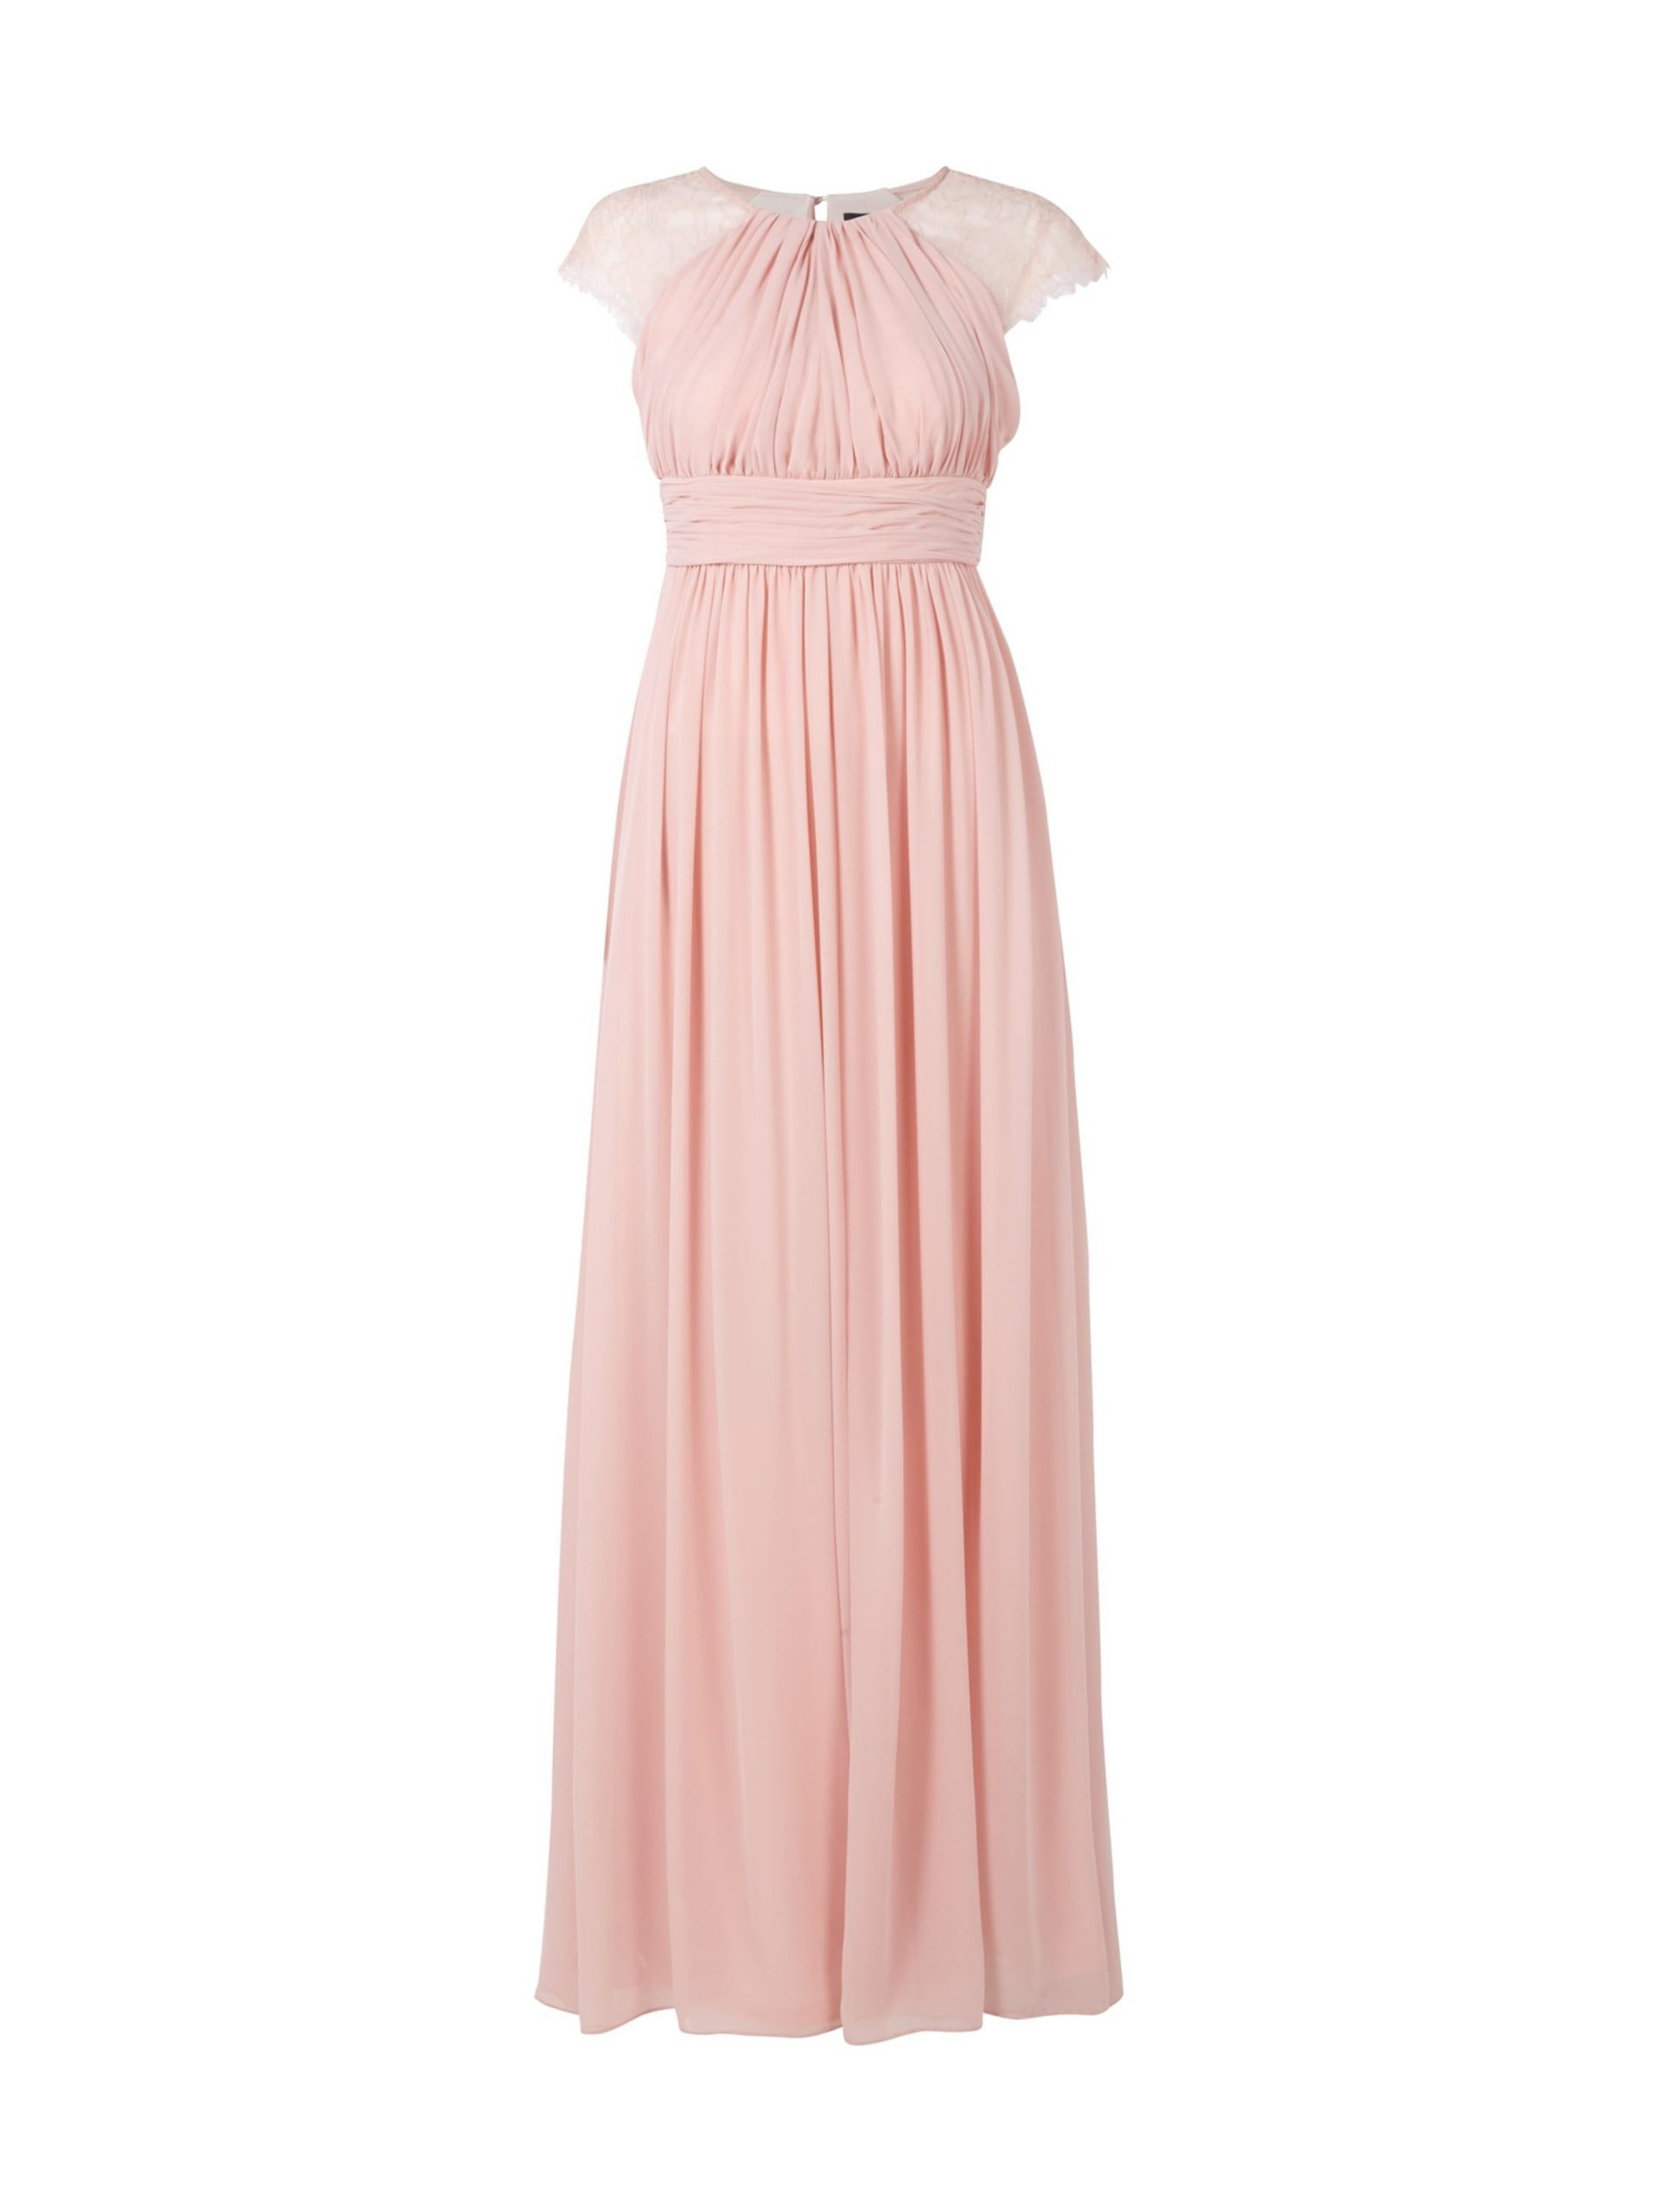 Großartig P&C Abendkleid Spezialgebiet13 Cool P&C Abendkleid Stylish